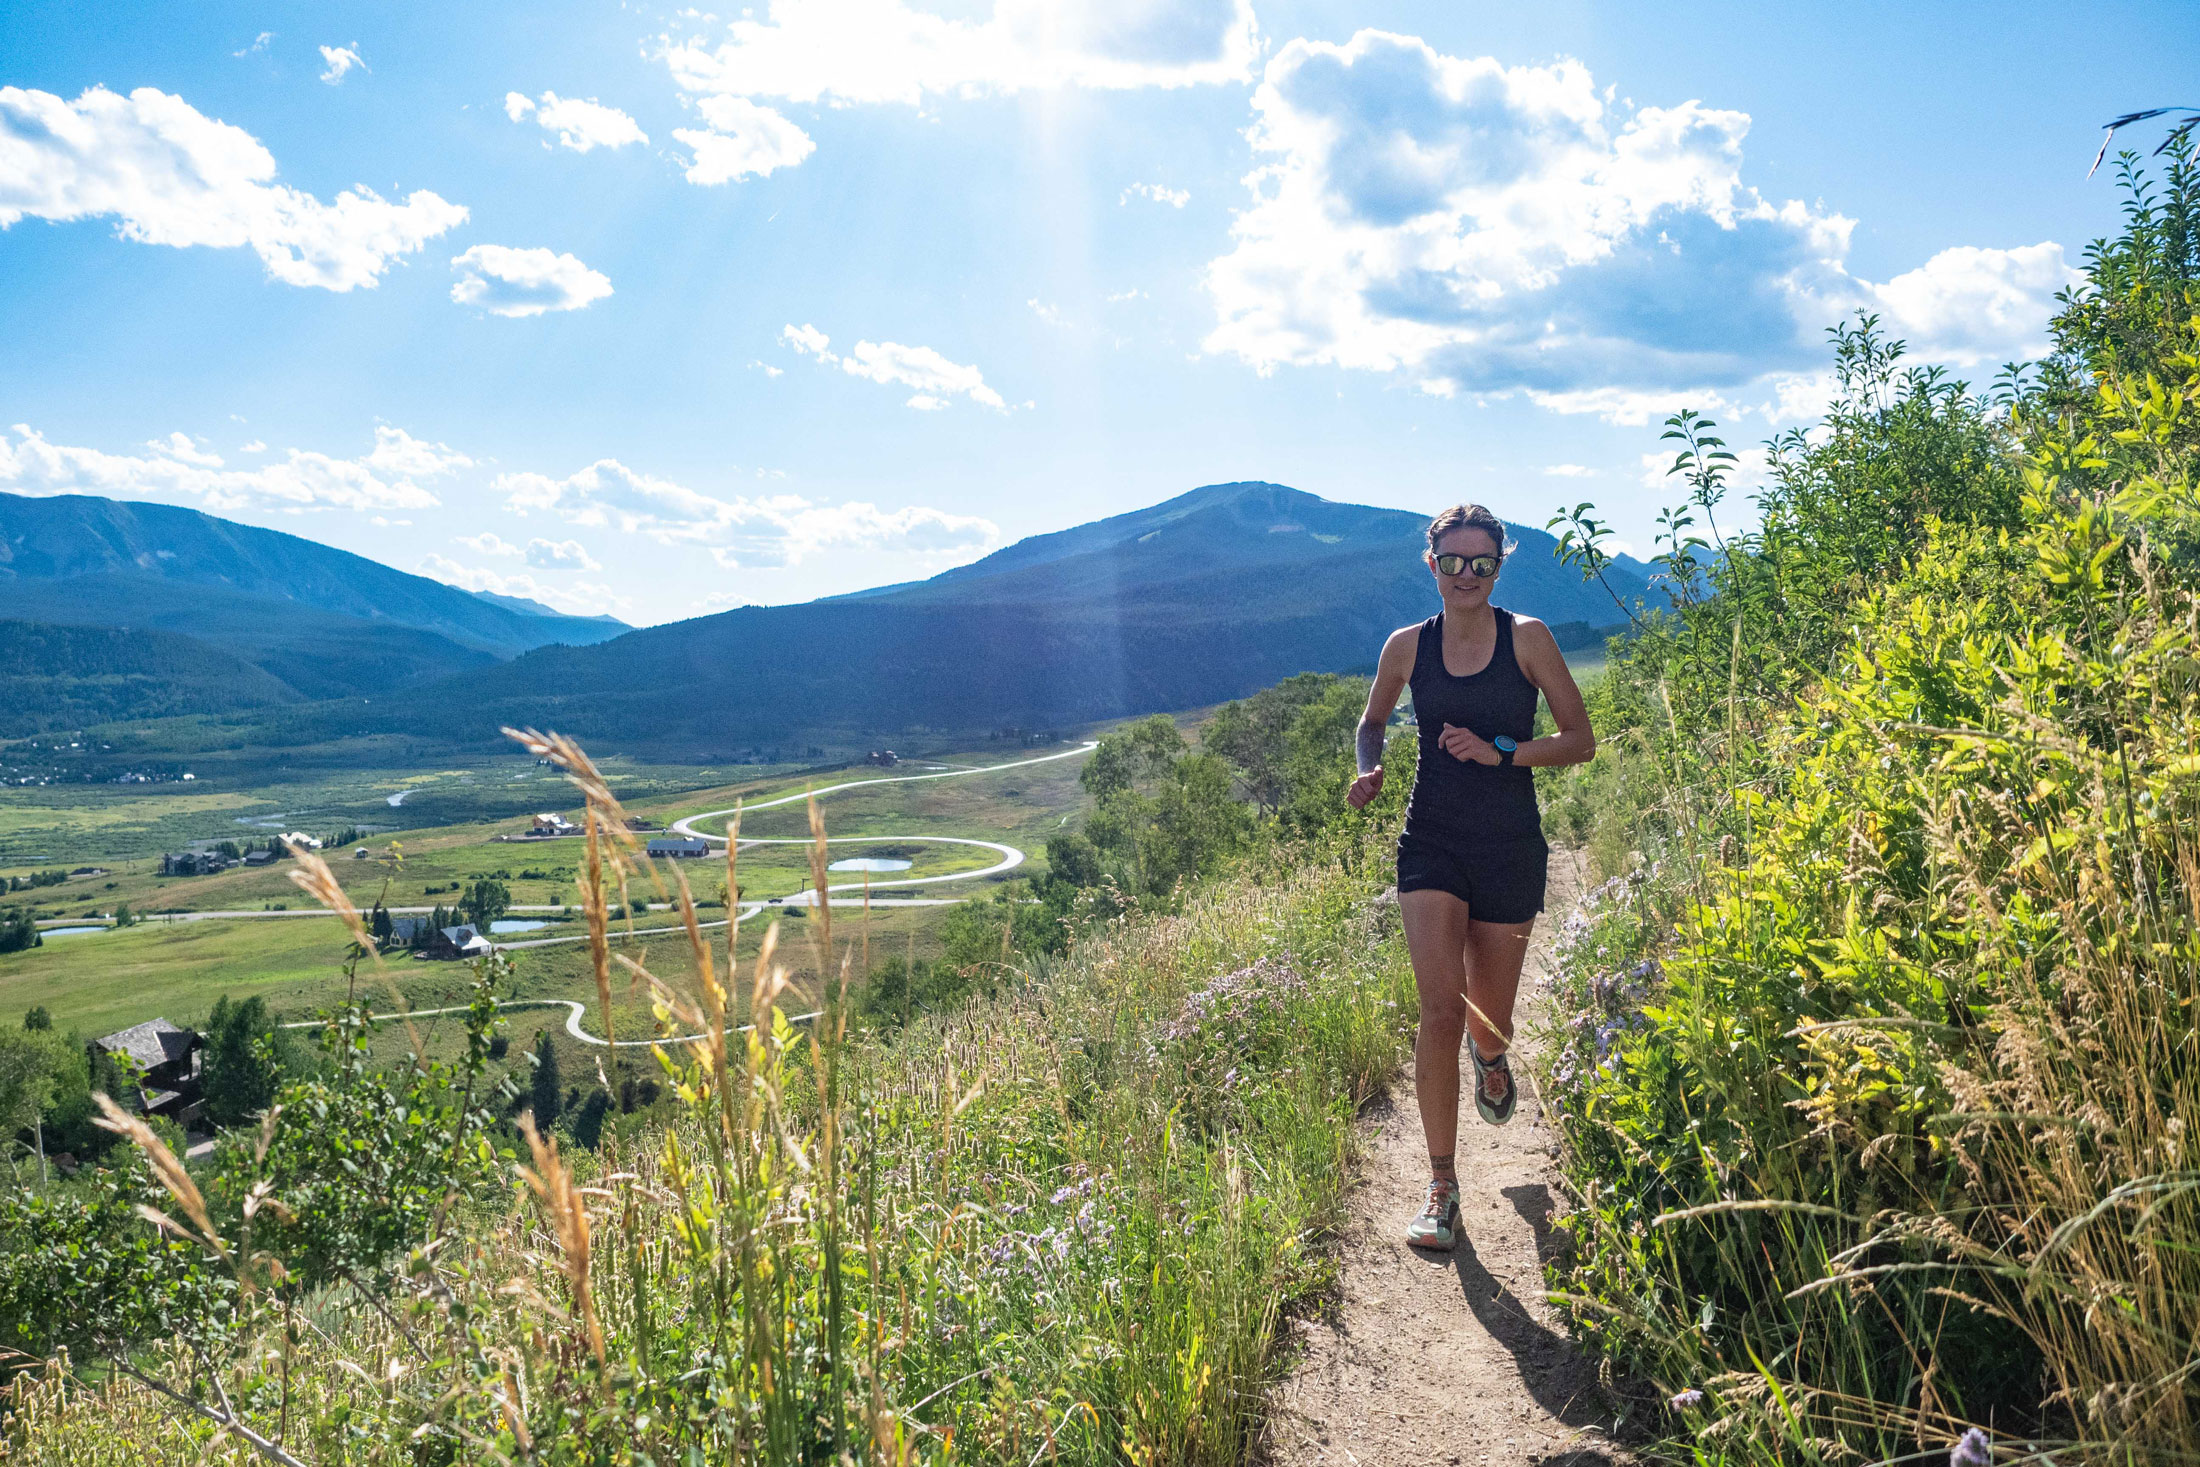 Maddie-Hart-young-ultrarunner